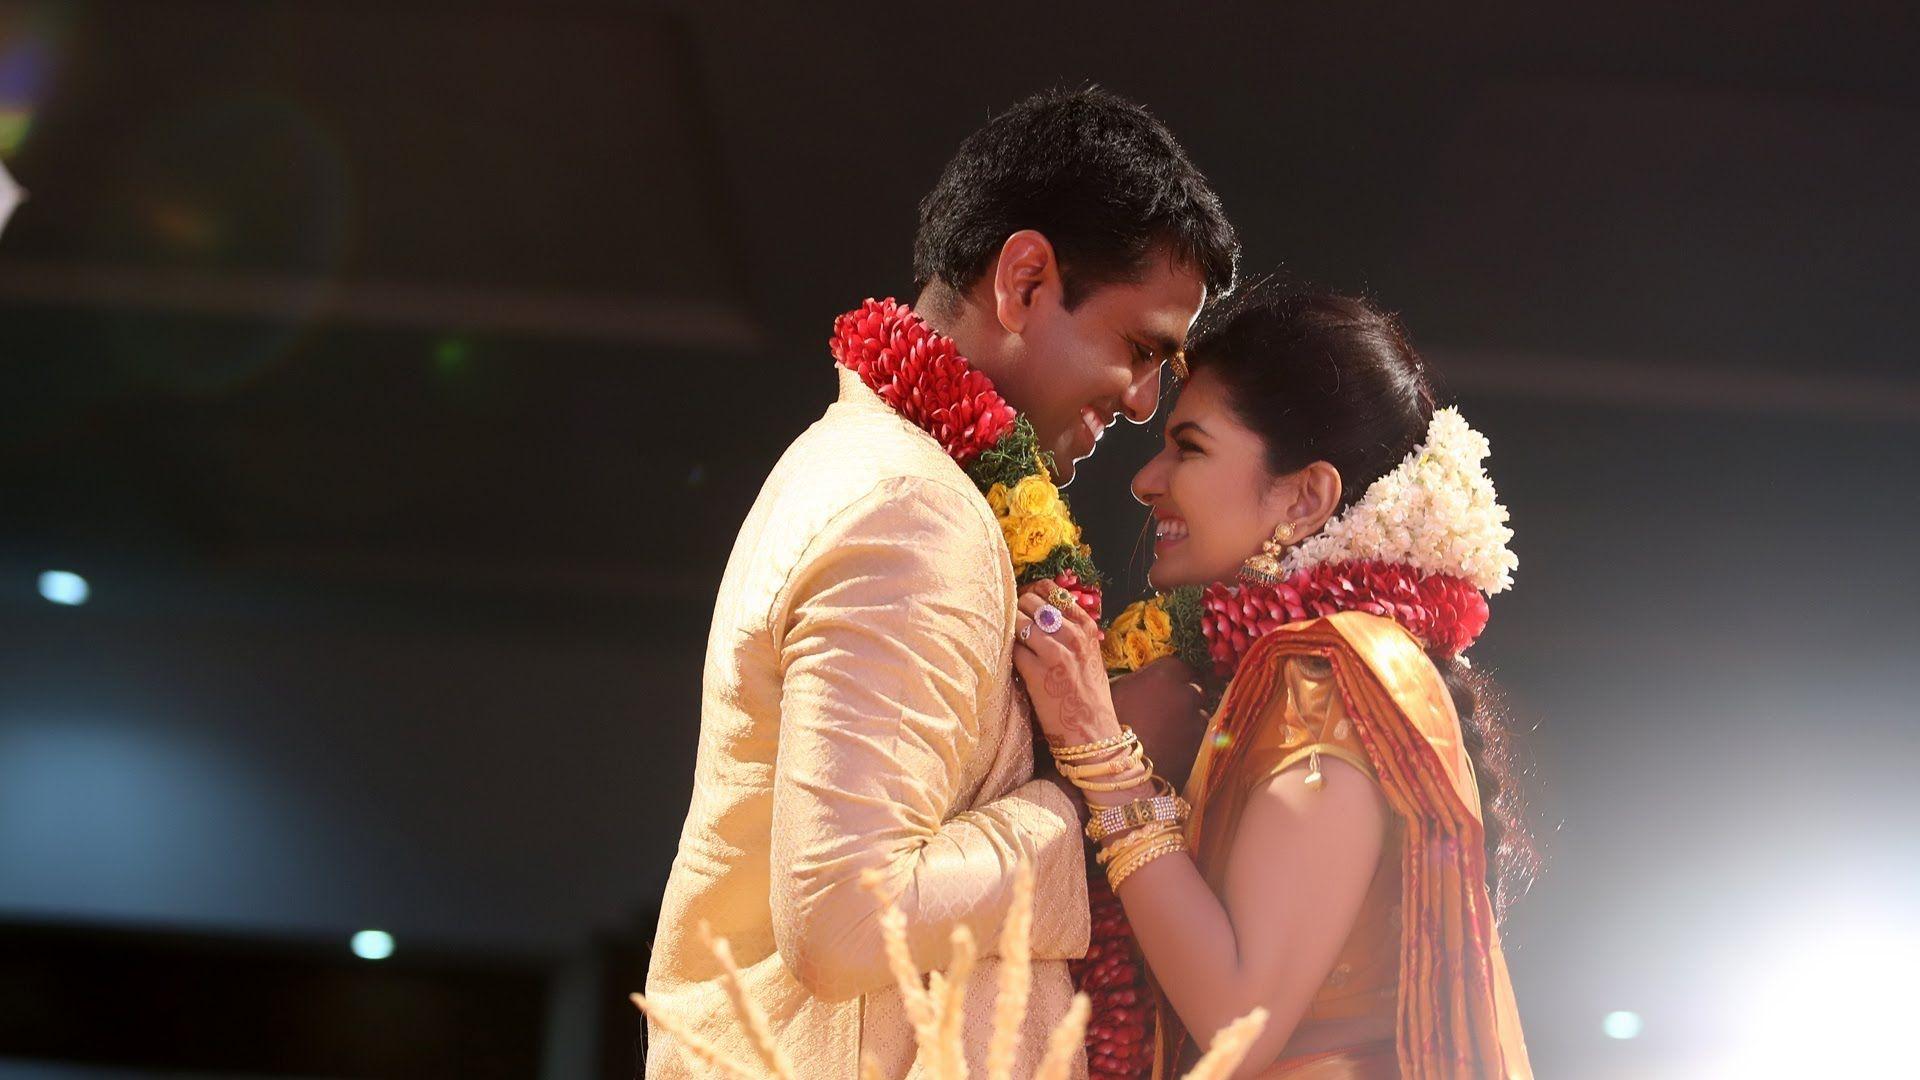 Pin by prinkya chopra on marriage pinterest grooms